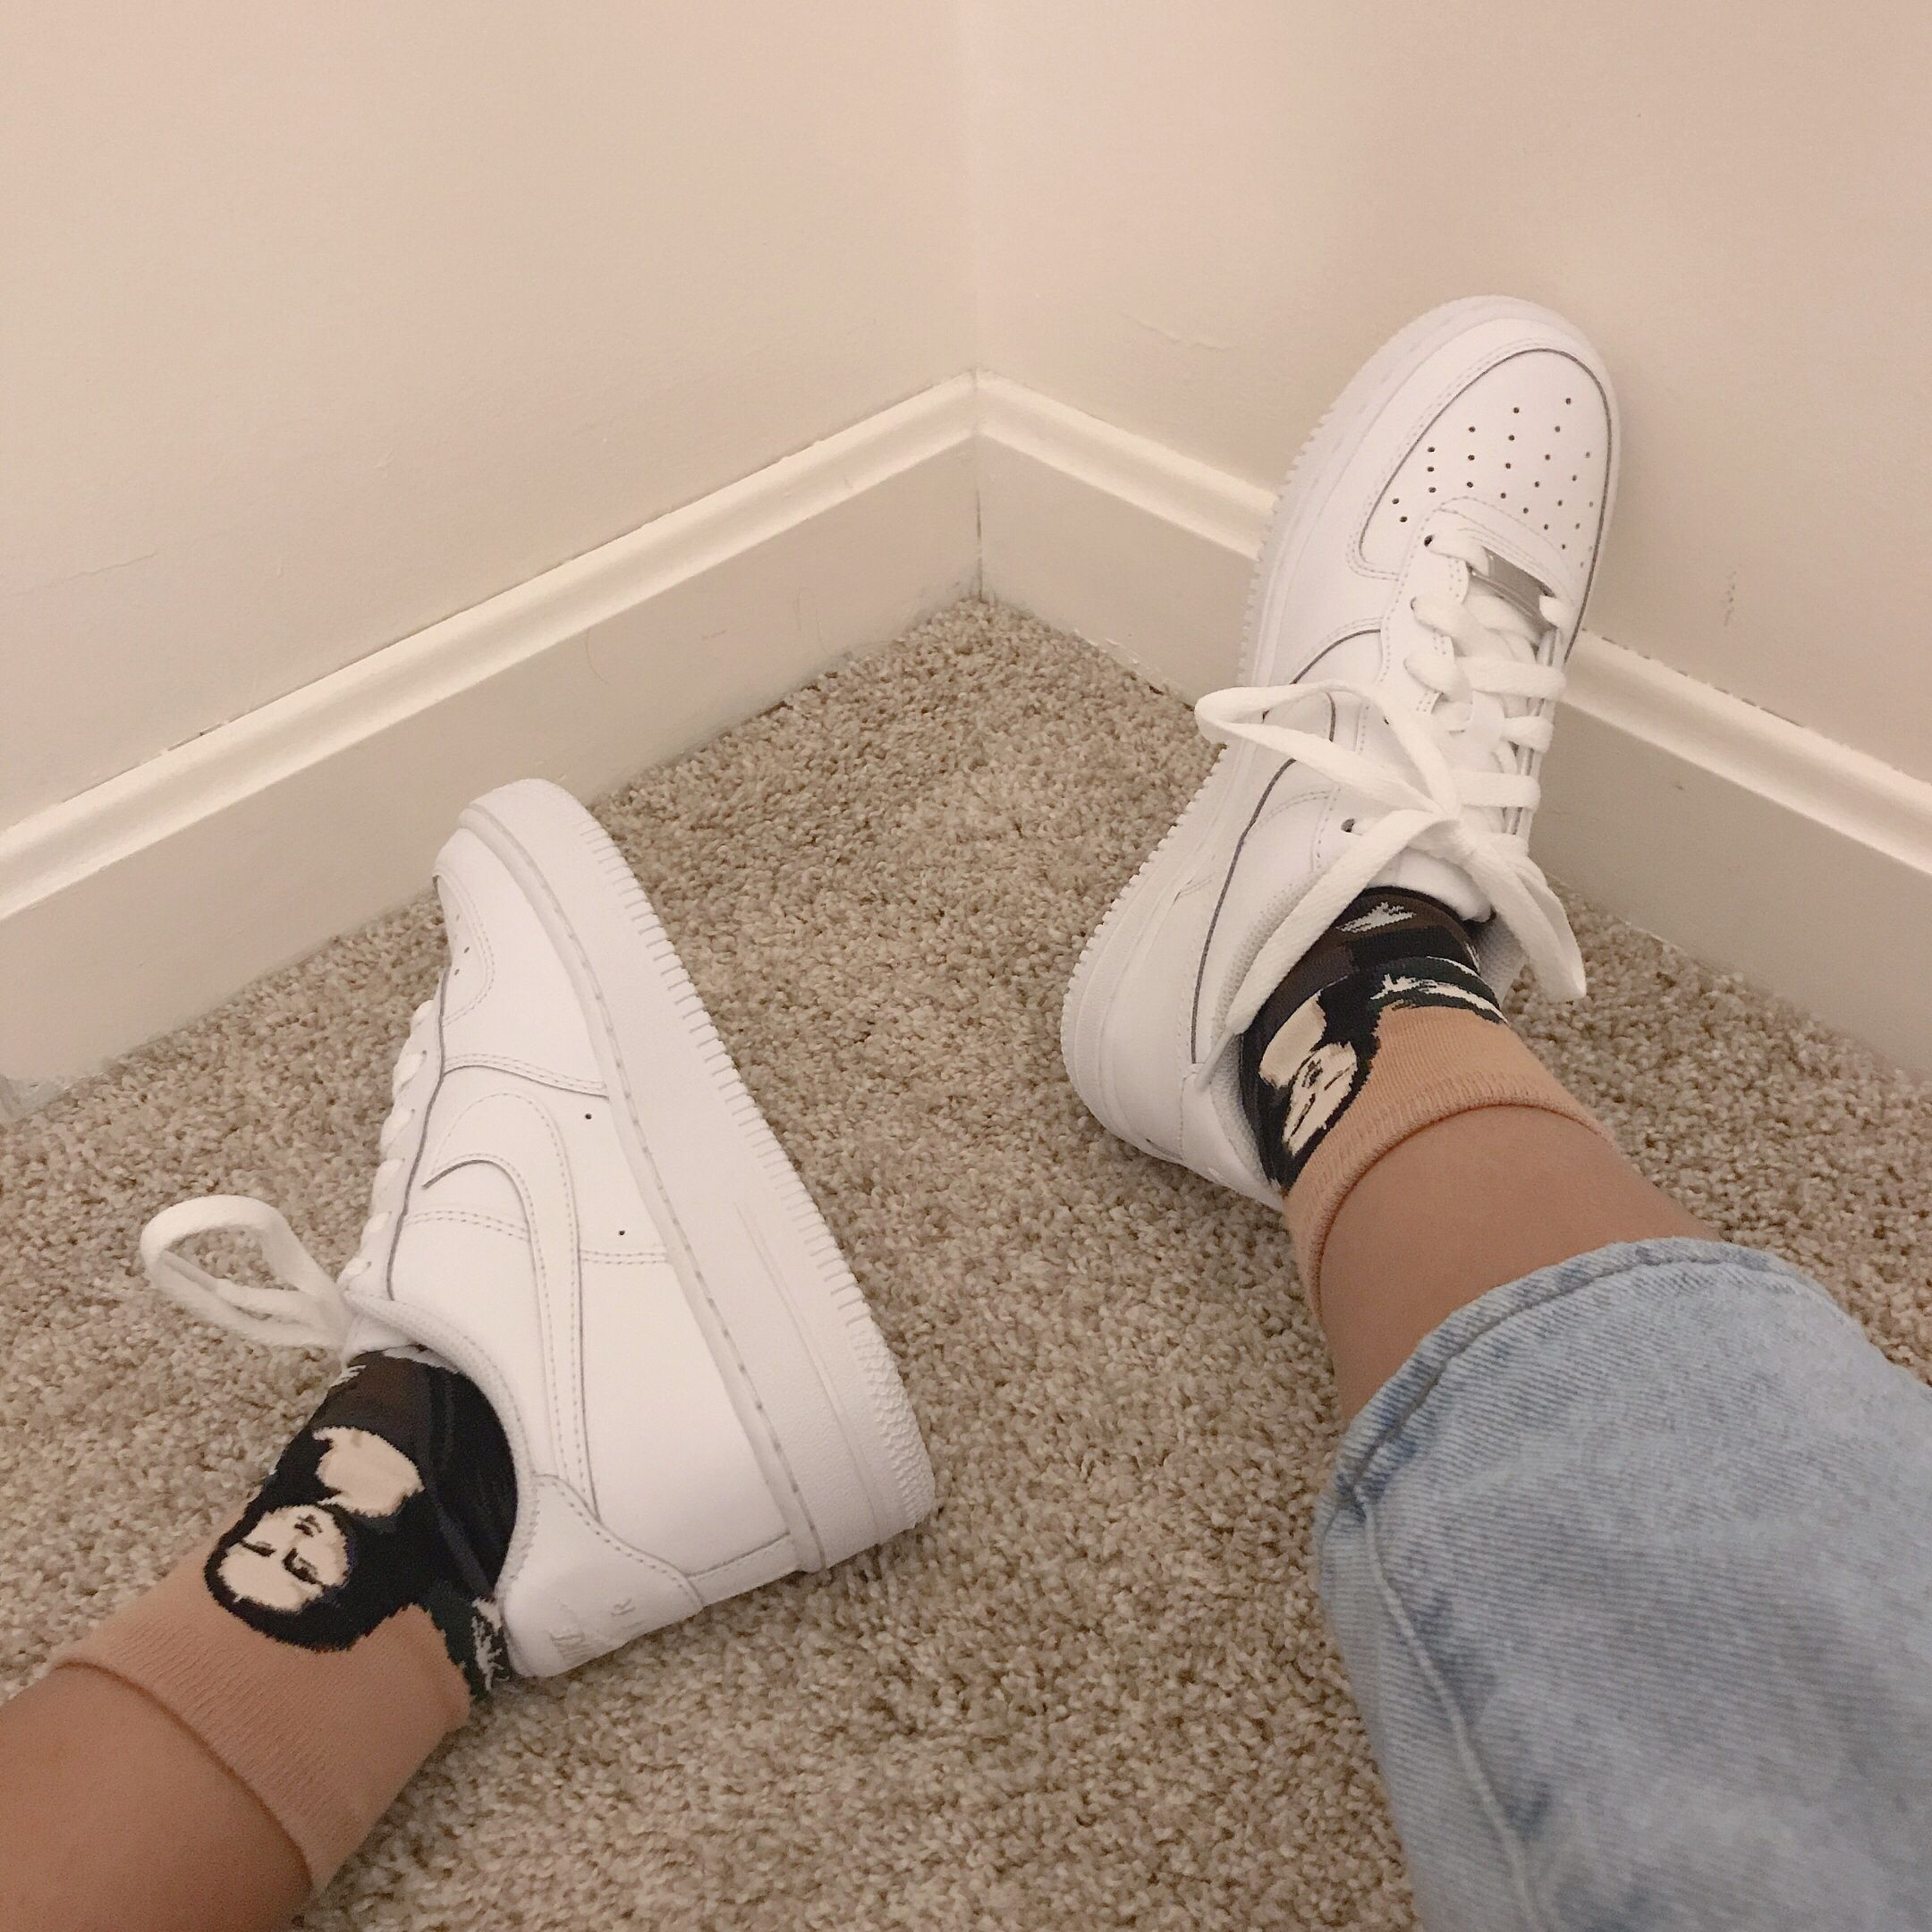 Nikeairforce #aesthetic #whitesneakers #arthoe #socks